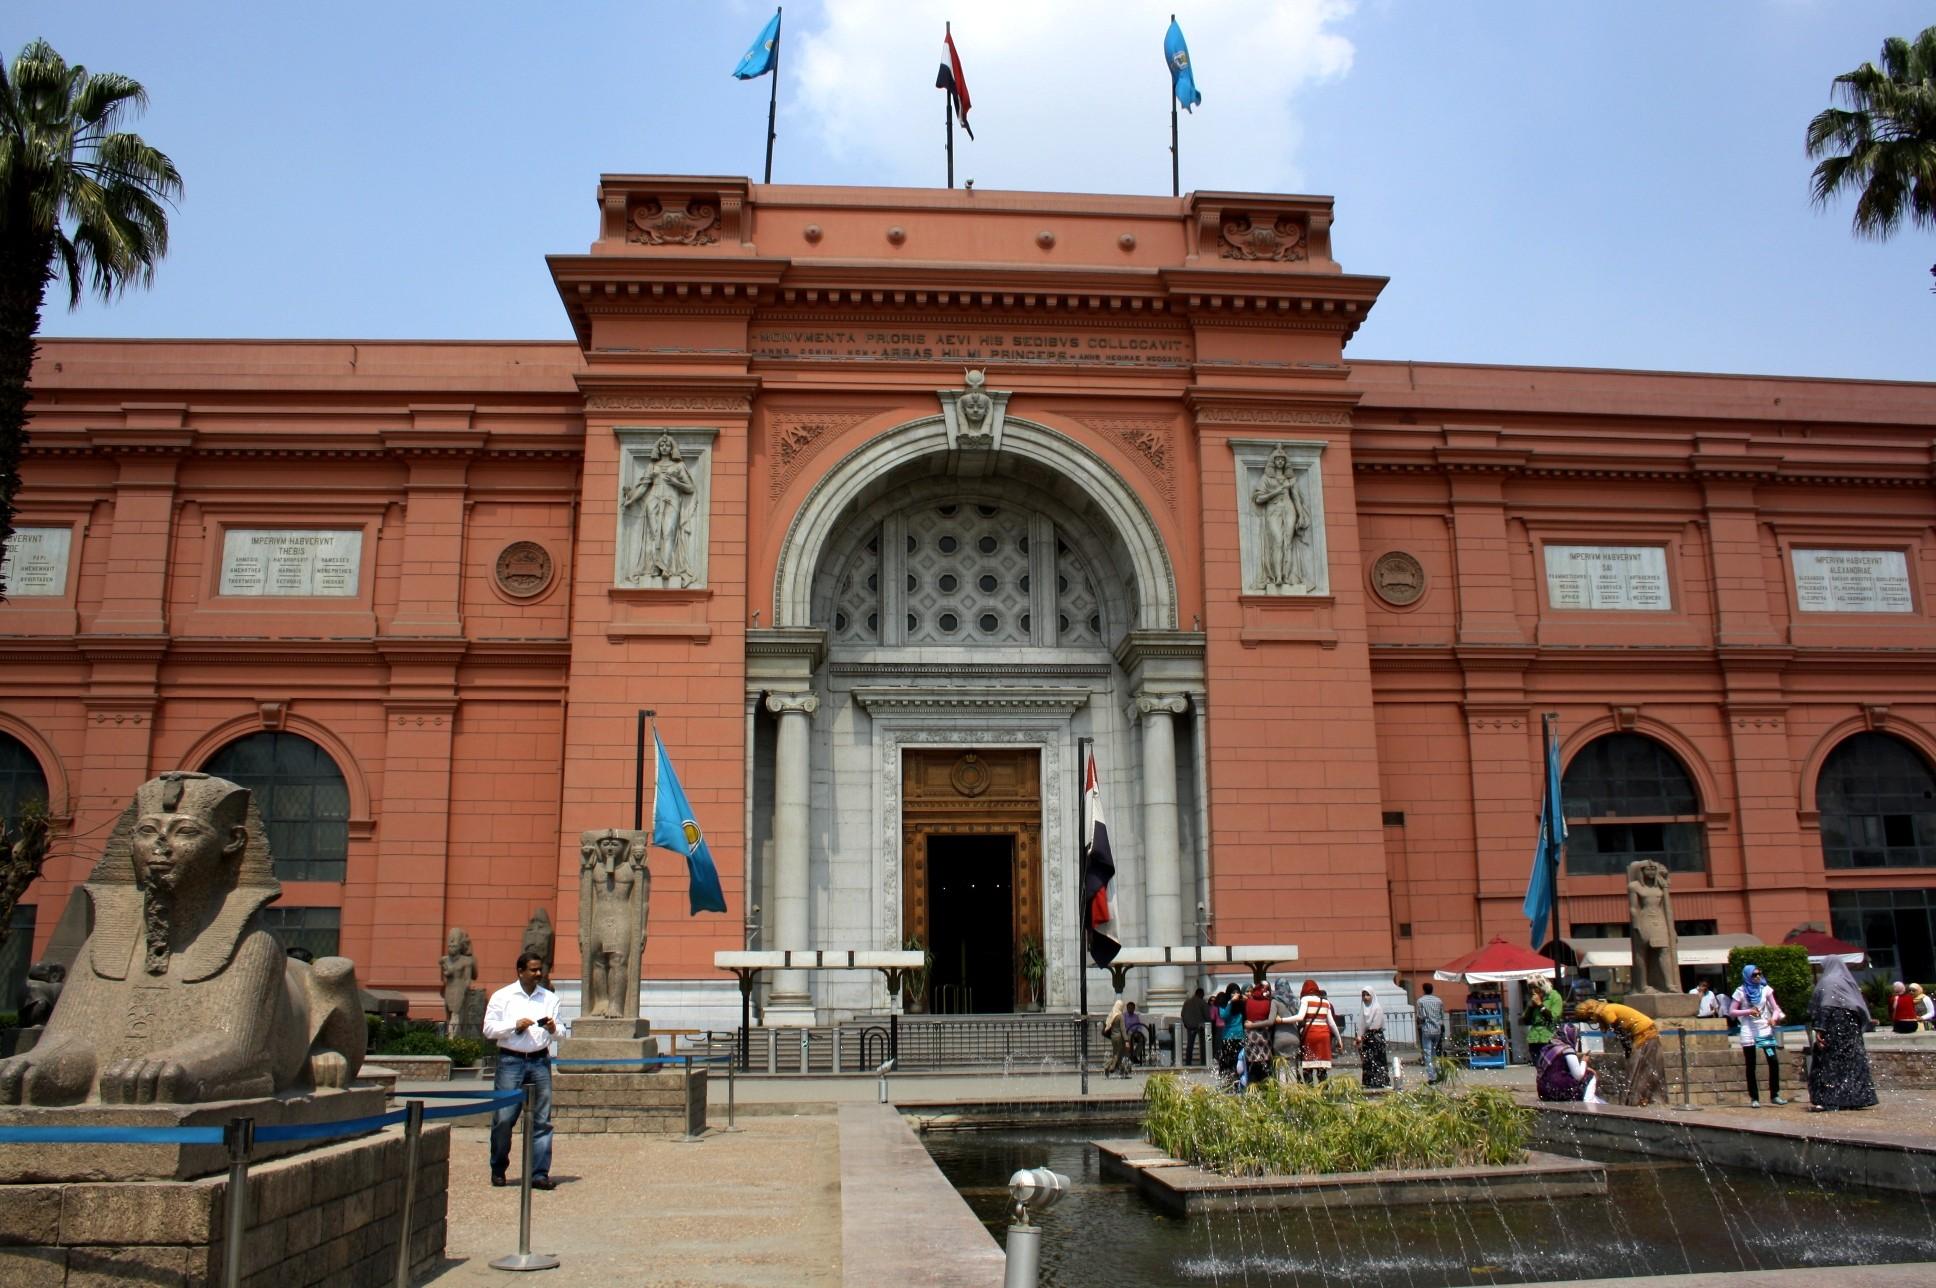 بالصور صور عن مصر , اجمل الصور عن مصر 169 3